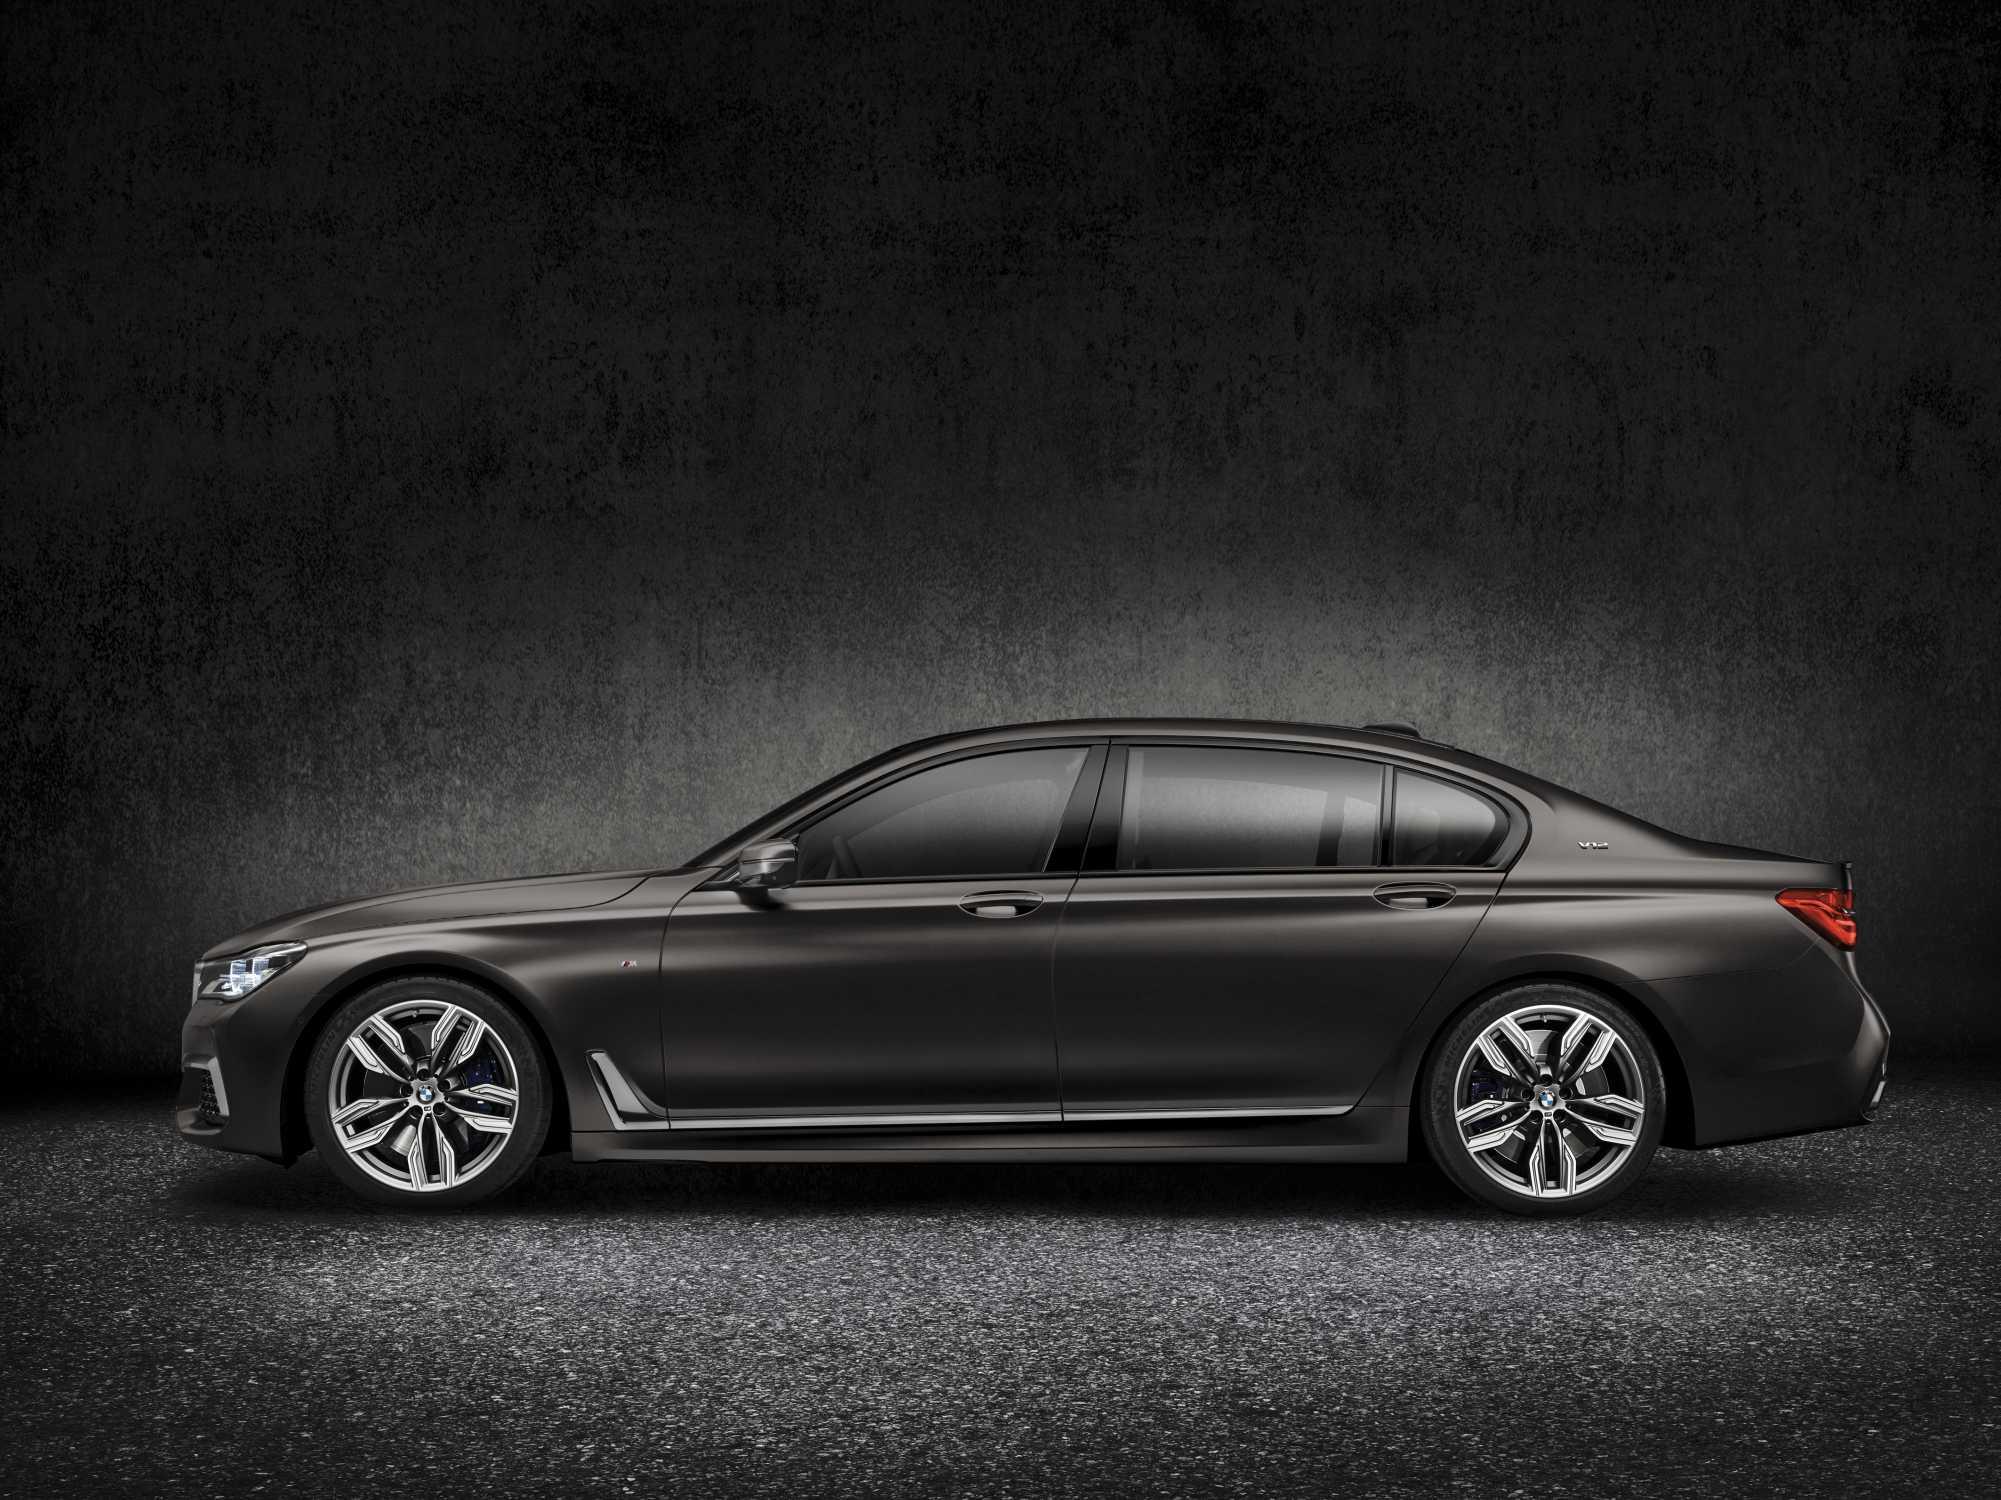 BMW at the 86th Geneva International Motor Show 2016.